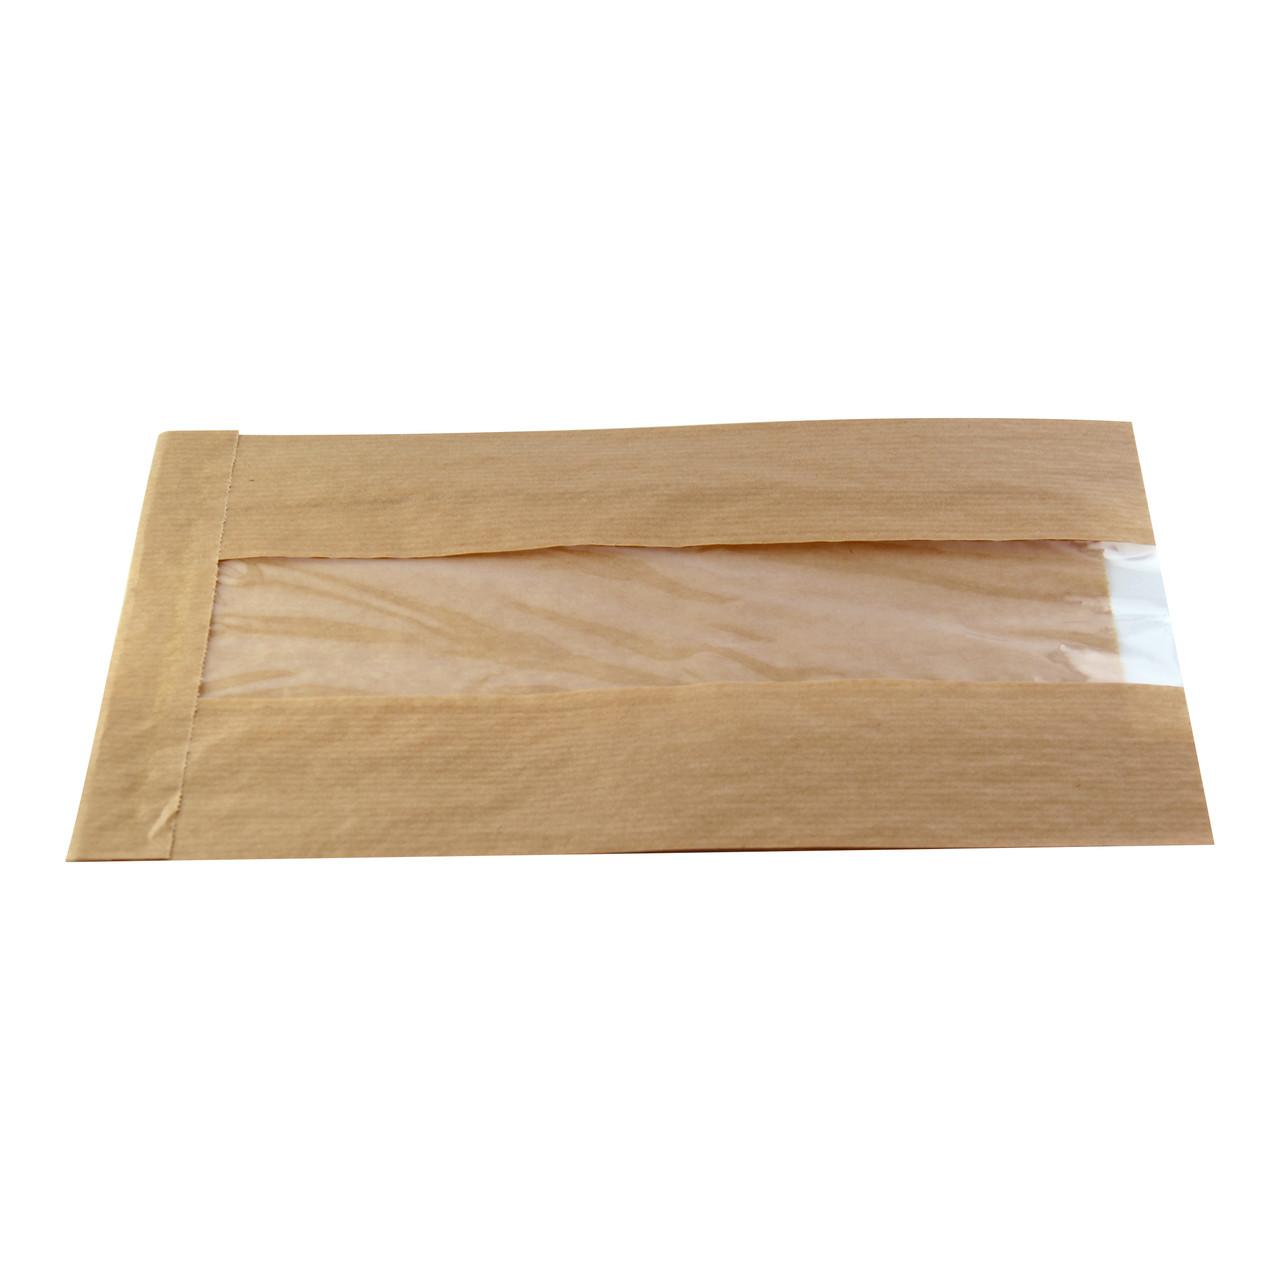 Brown Kraft Bag With Window - L:8.85 x W:4.7 x H:1.6in